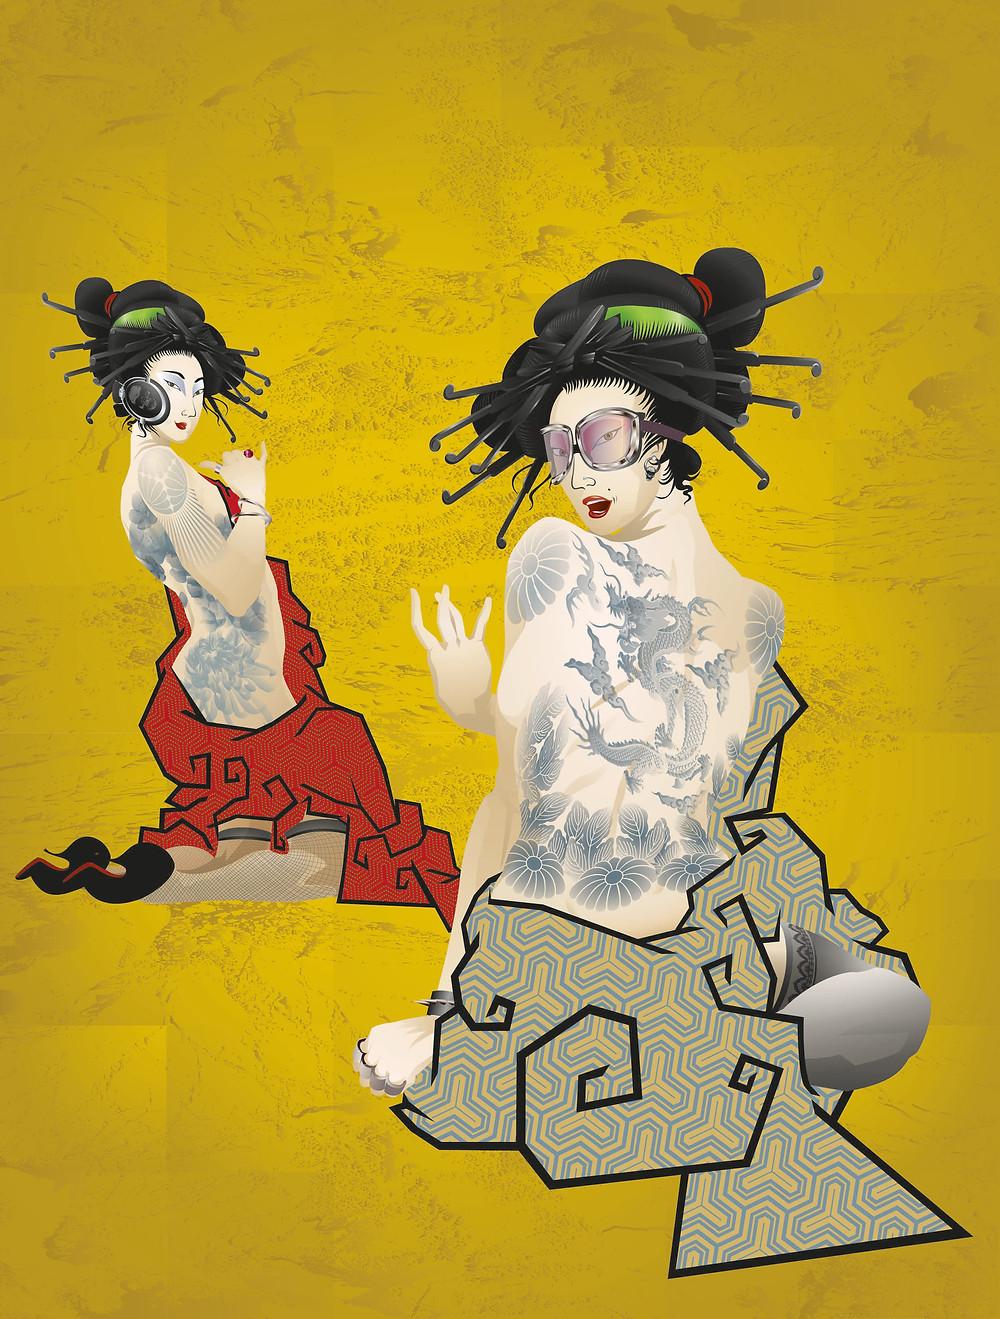 """Geisha Girls"" by Booda Brand, 2013"